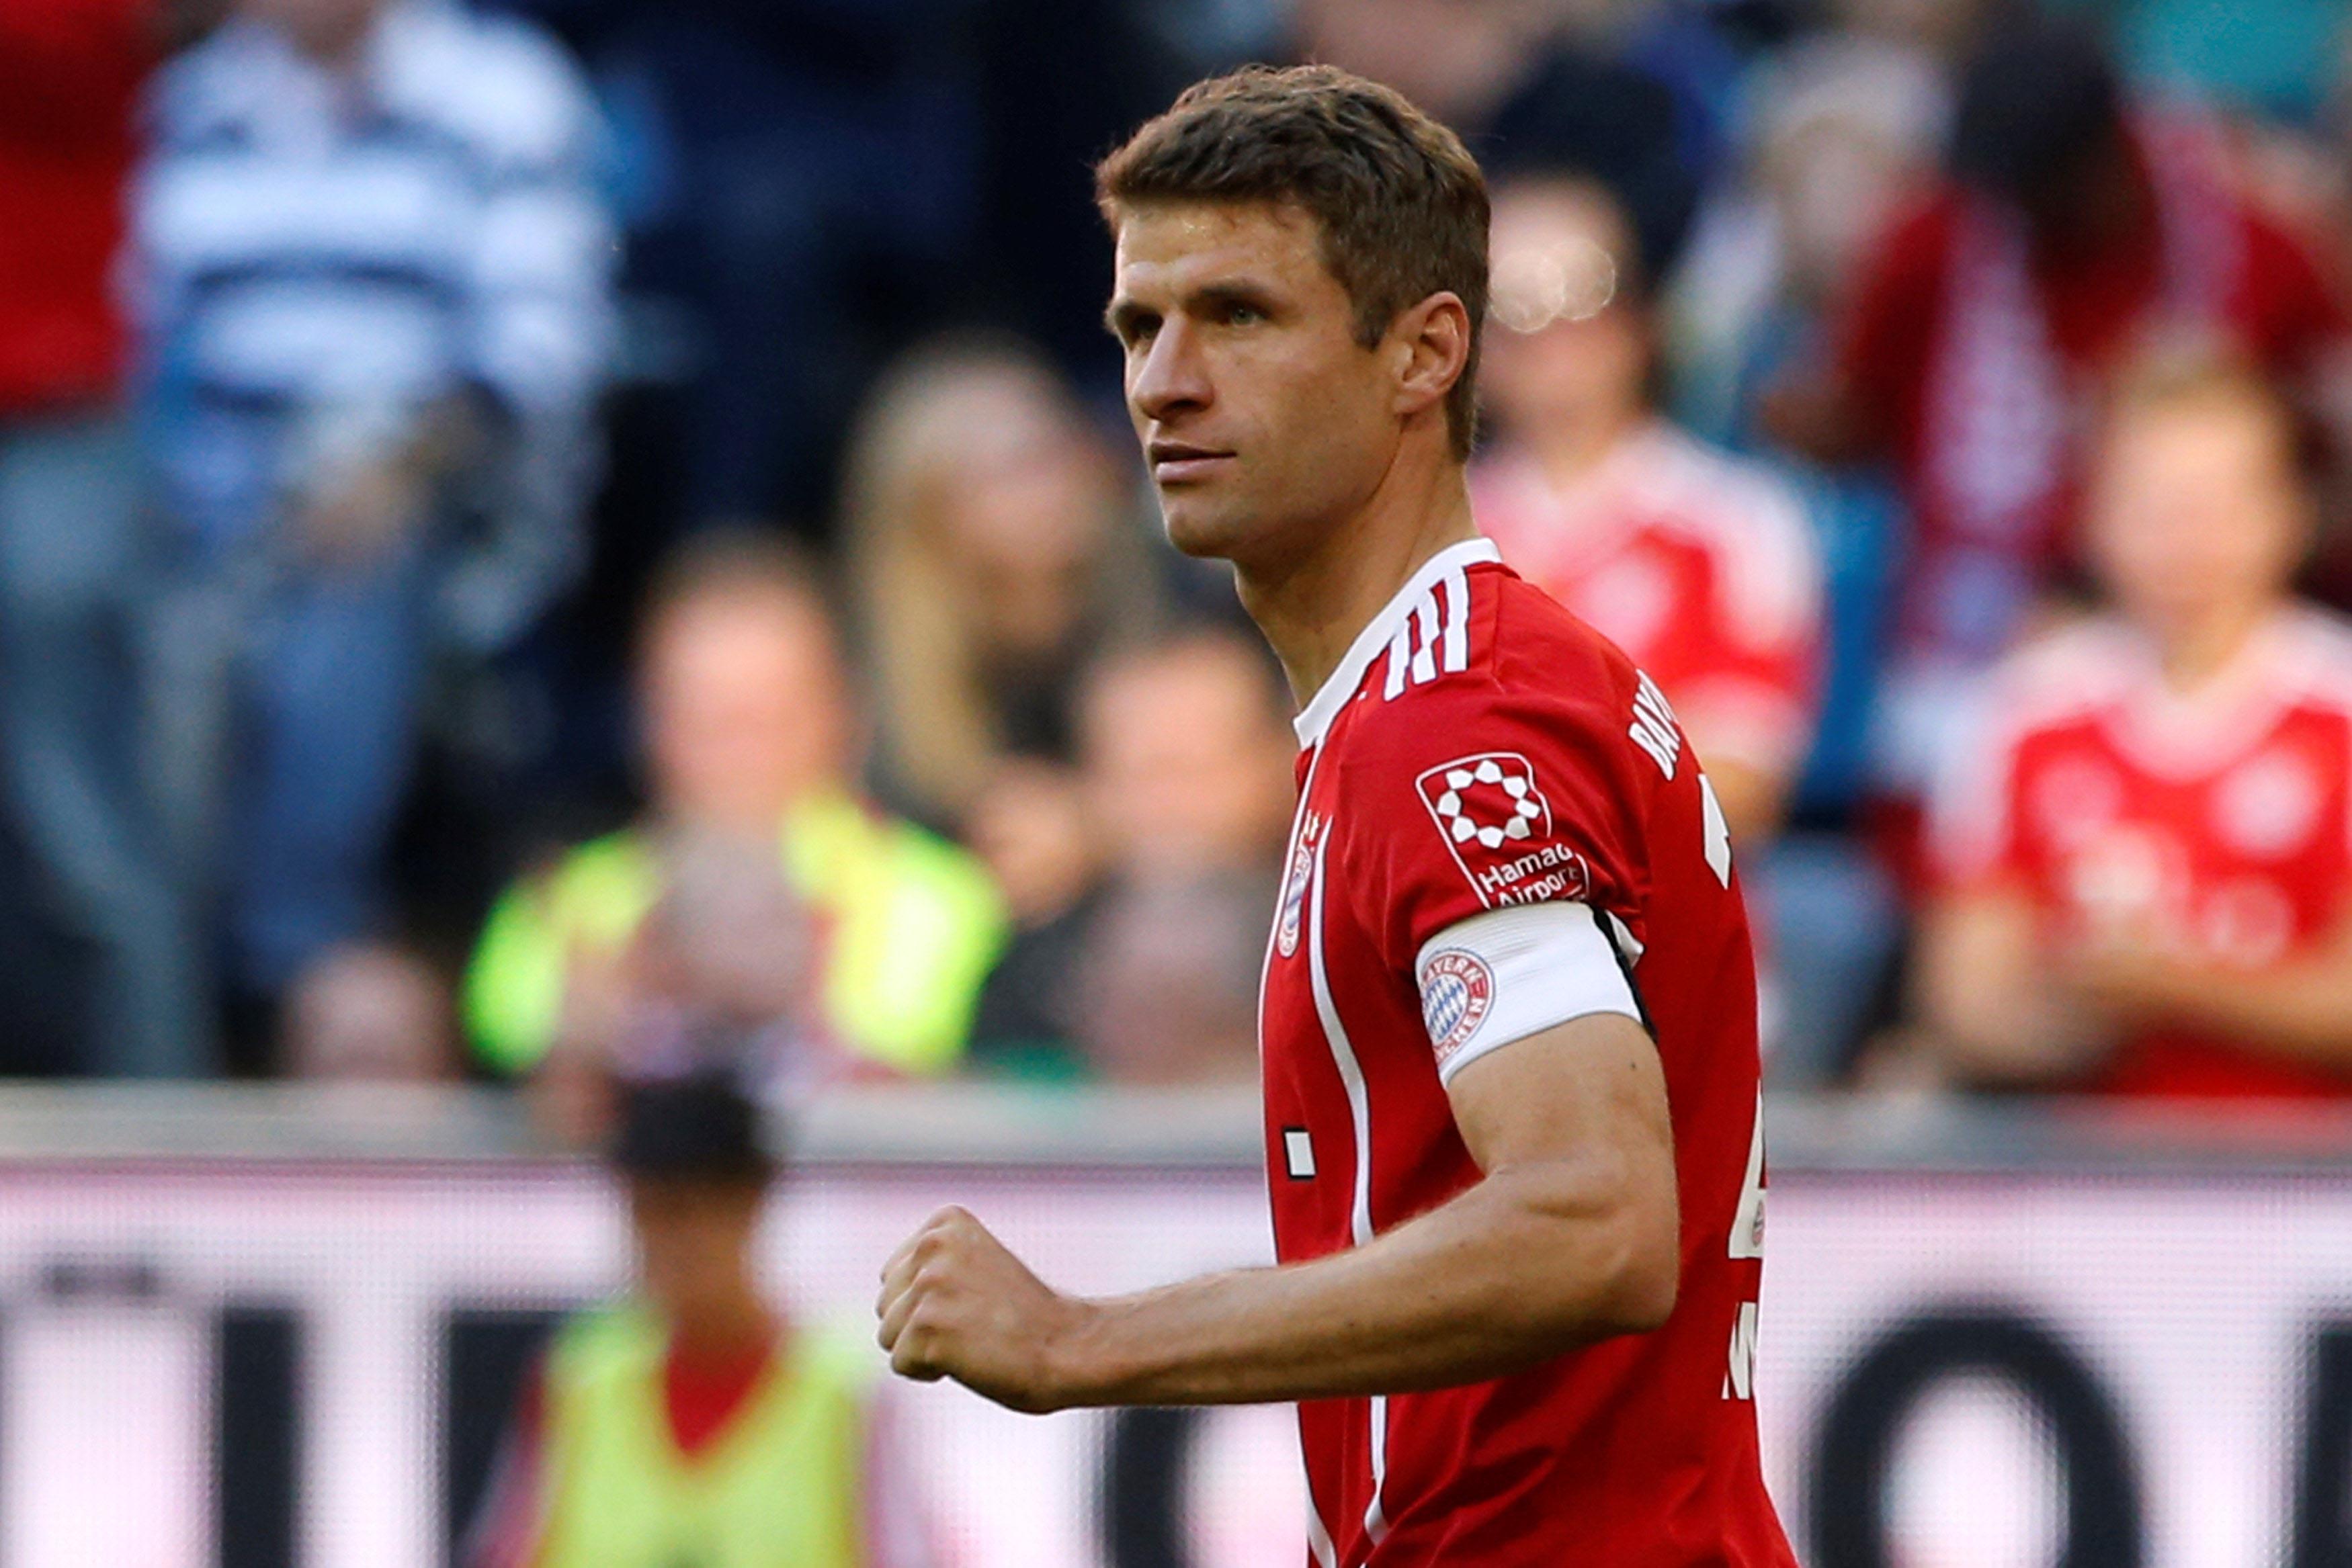 Football - Etranger - Bundesliga: M'gladbach-Bayern Munich en direct